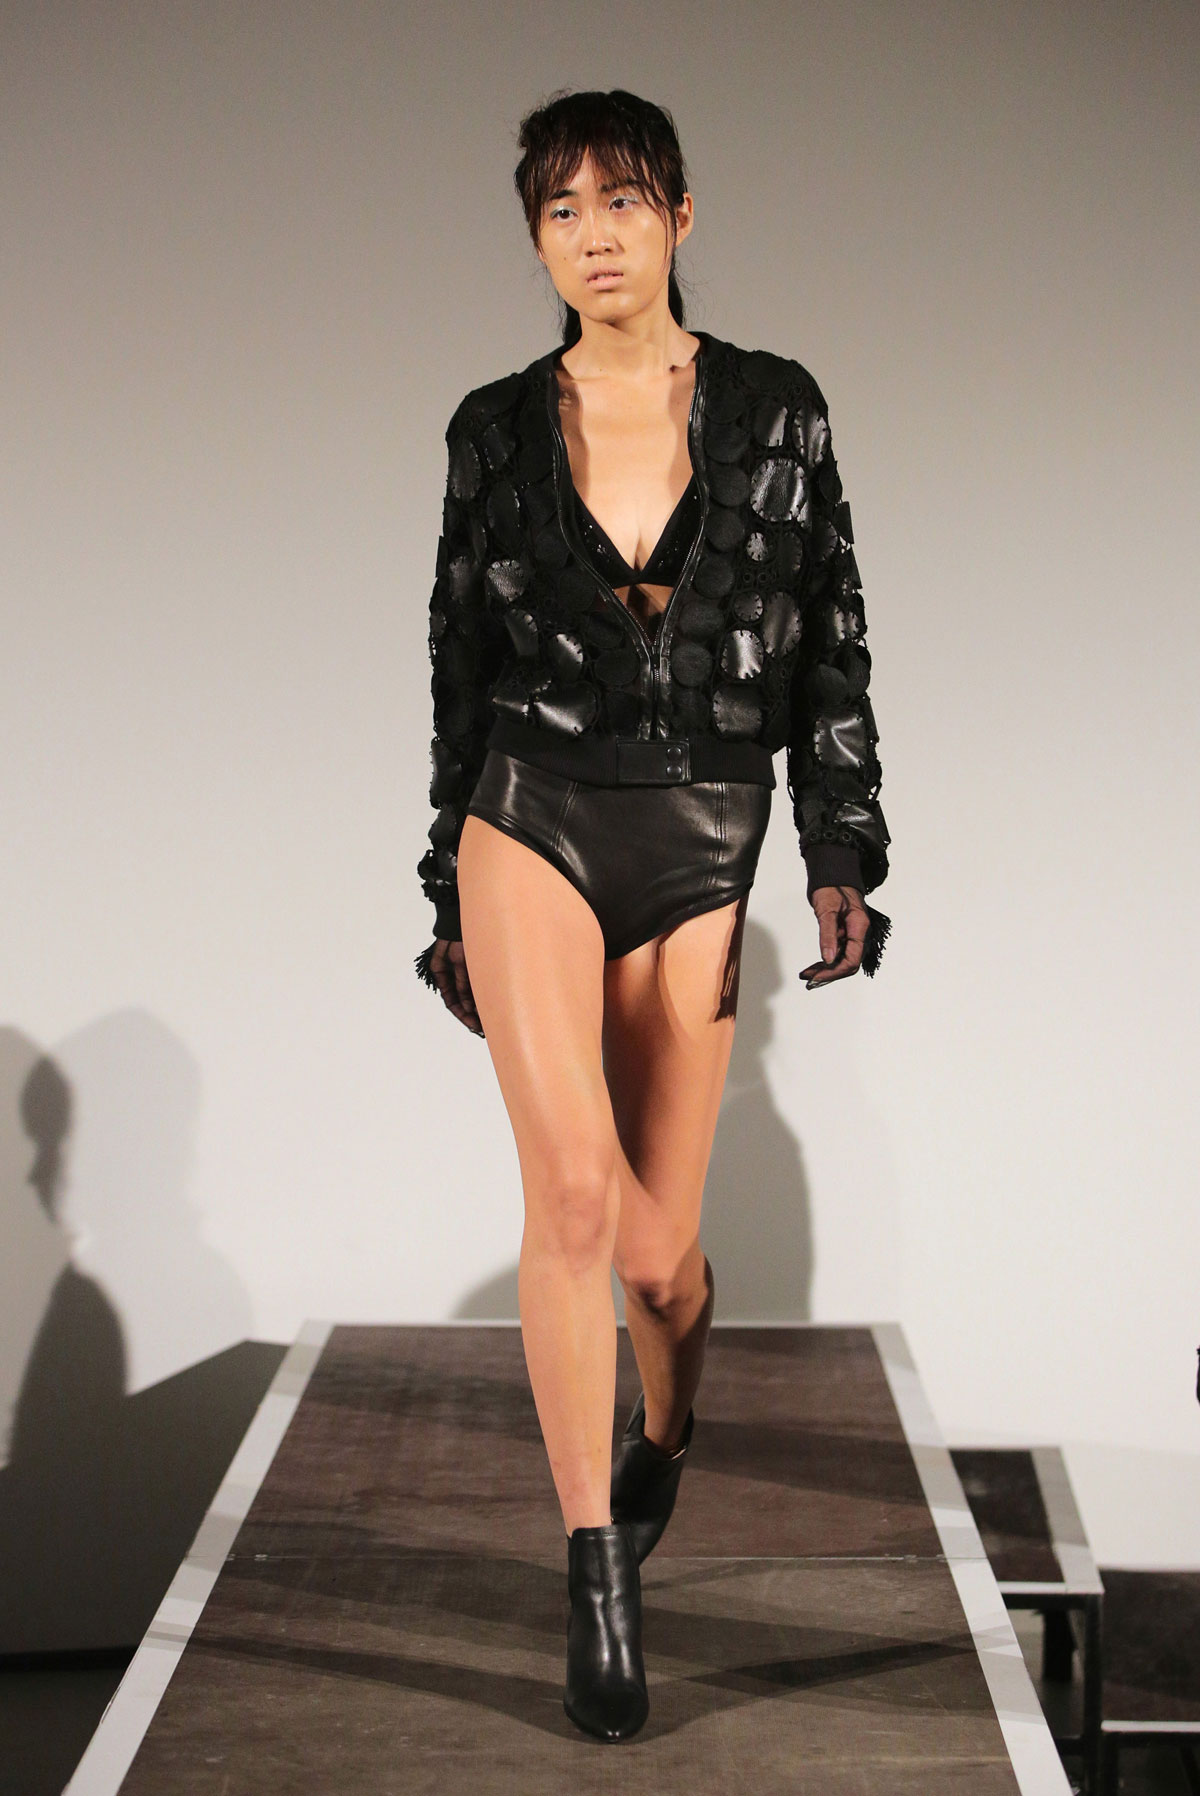 Models at Mercedes-Benz Fashion Week Spring Summer 2015 - part 2